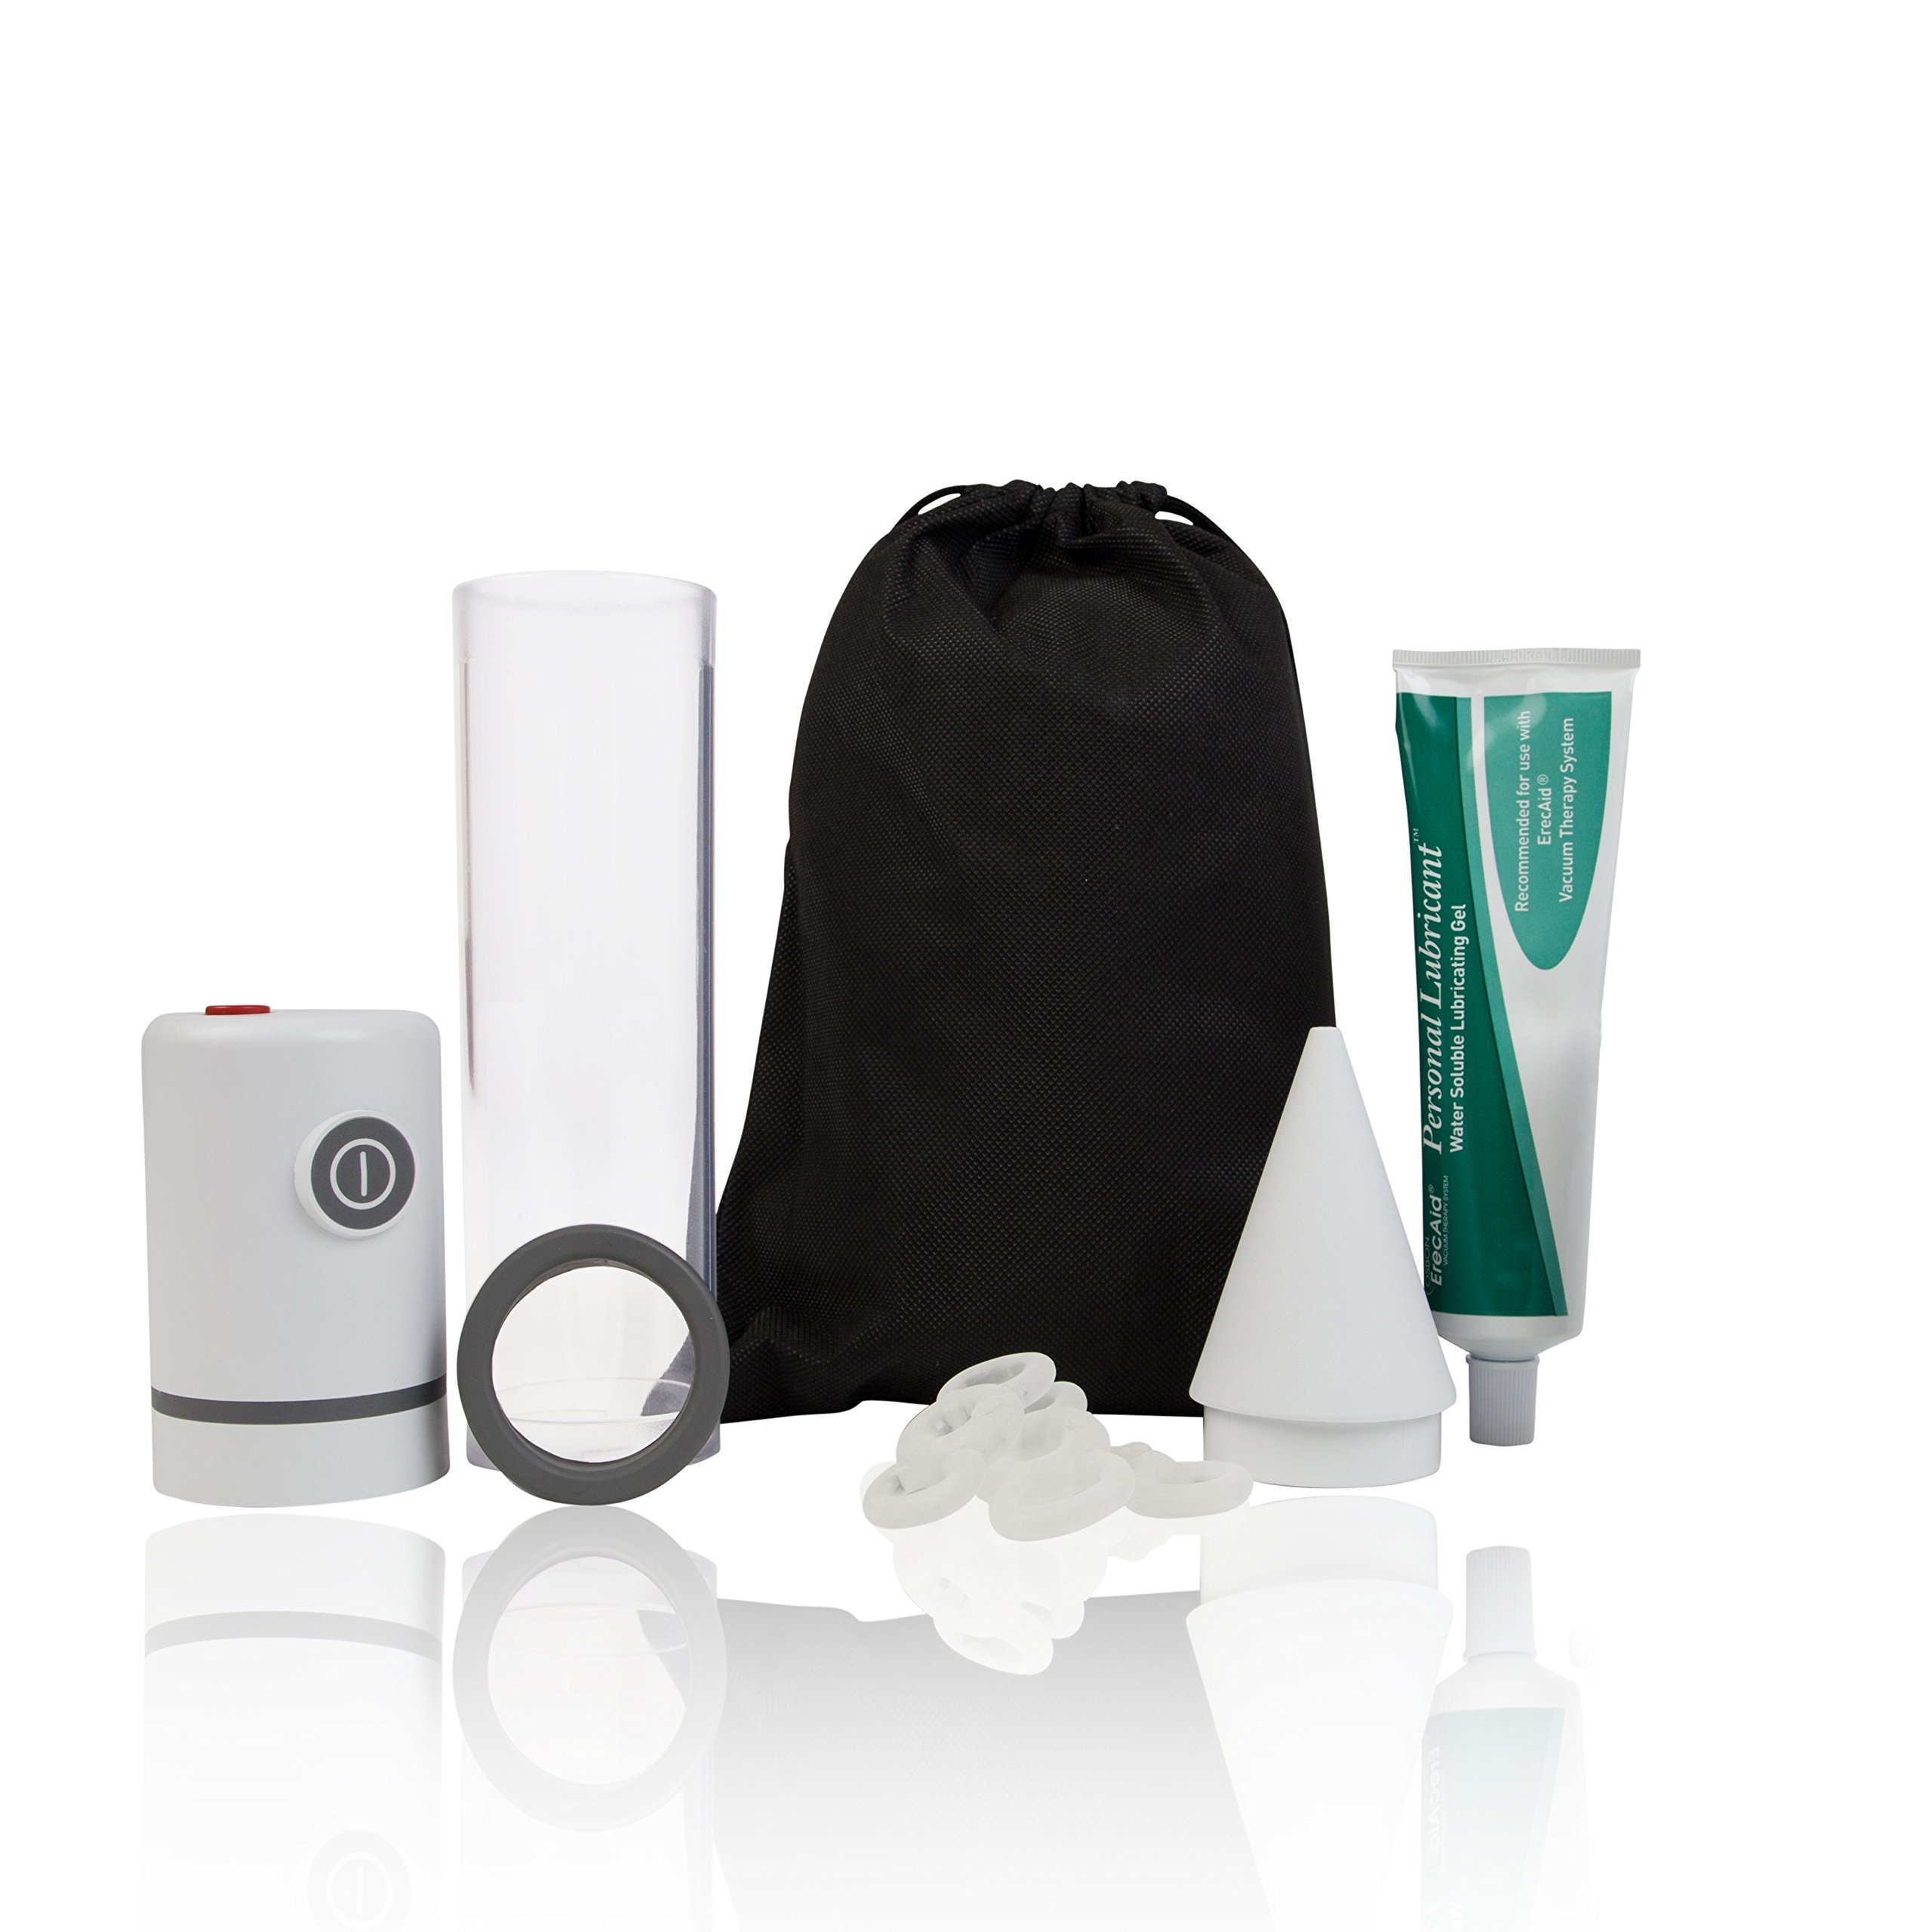 Vacuum Pump for Men, Natural Alternative to Erectile Dysfunction Pills, Automatic Penis Pump, Men's Pump Kit for Erectile Dysfunction - Pos-T-Vac, BOS-2000-2 by POS-T-VAC